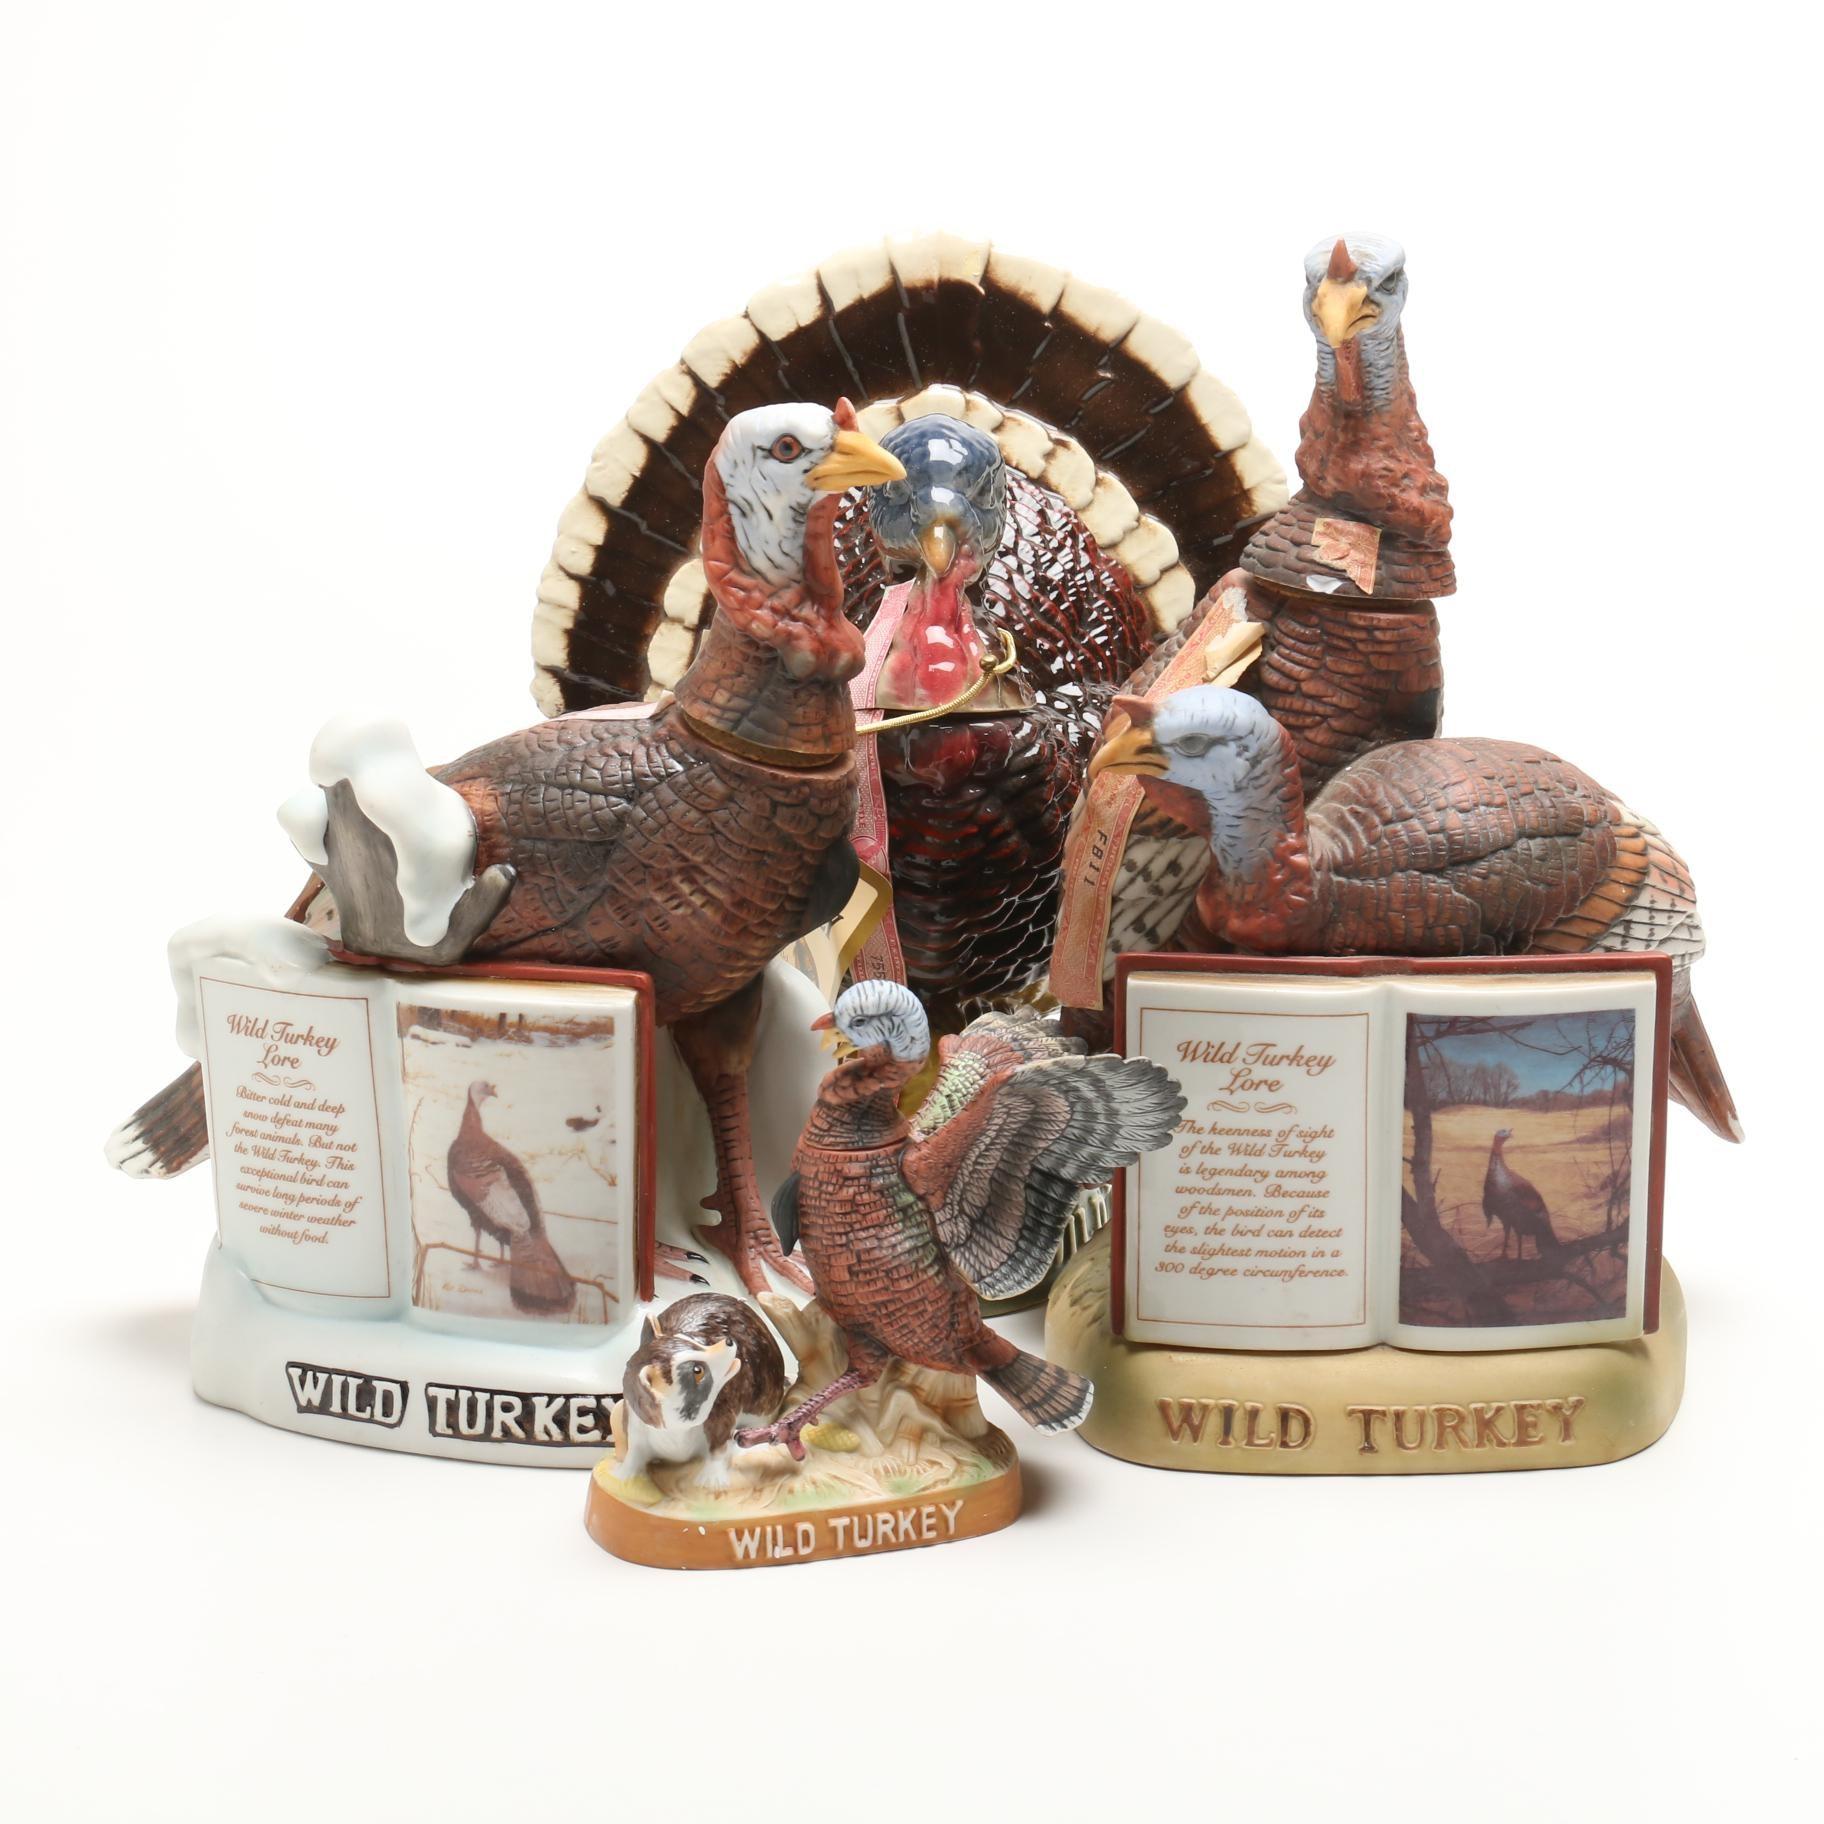 Vintage Wild Turkey Decanters